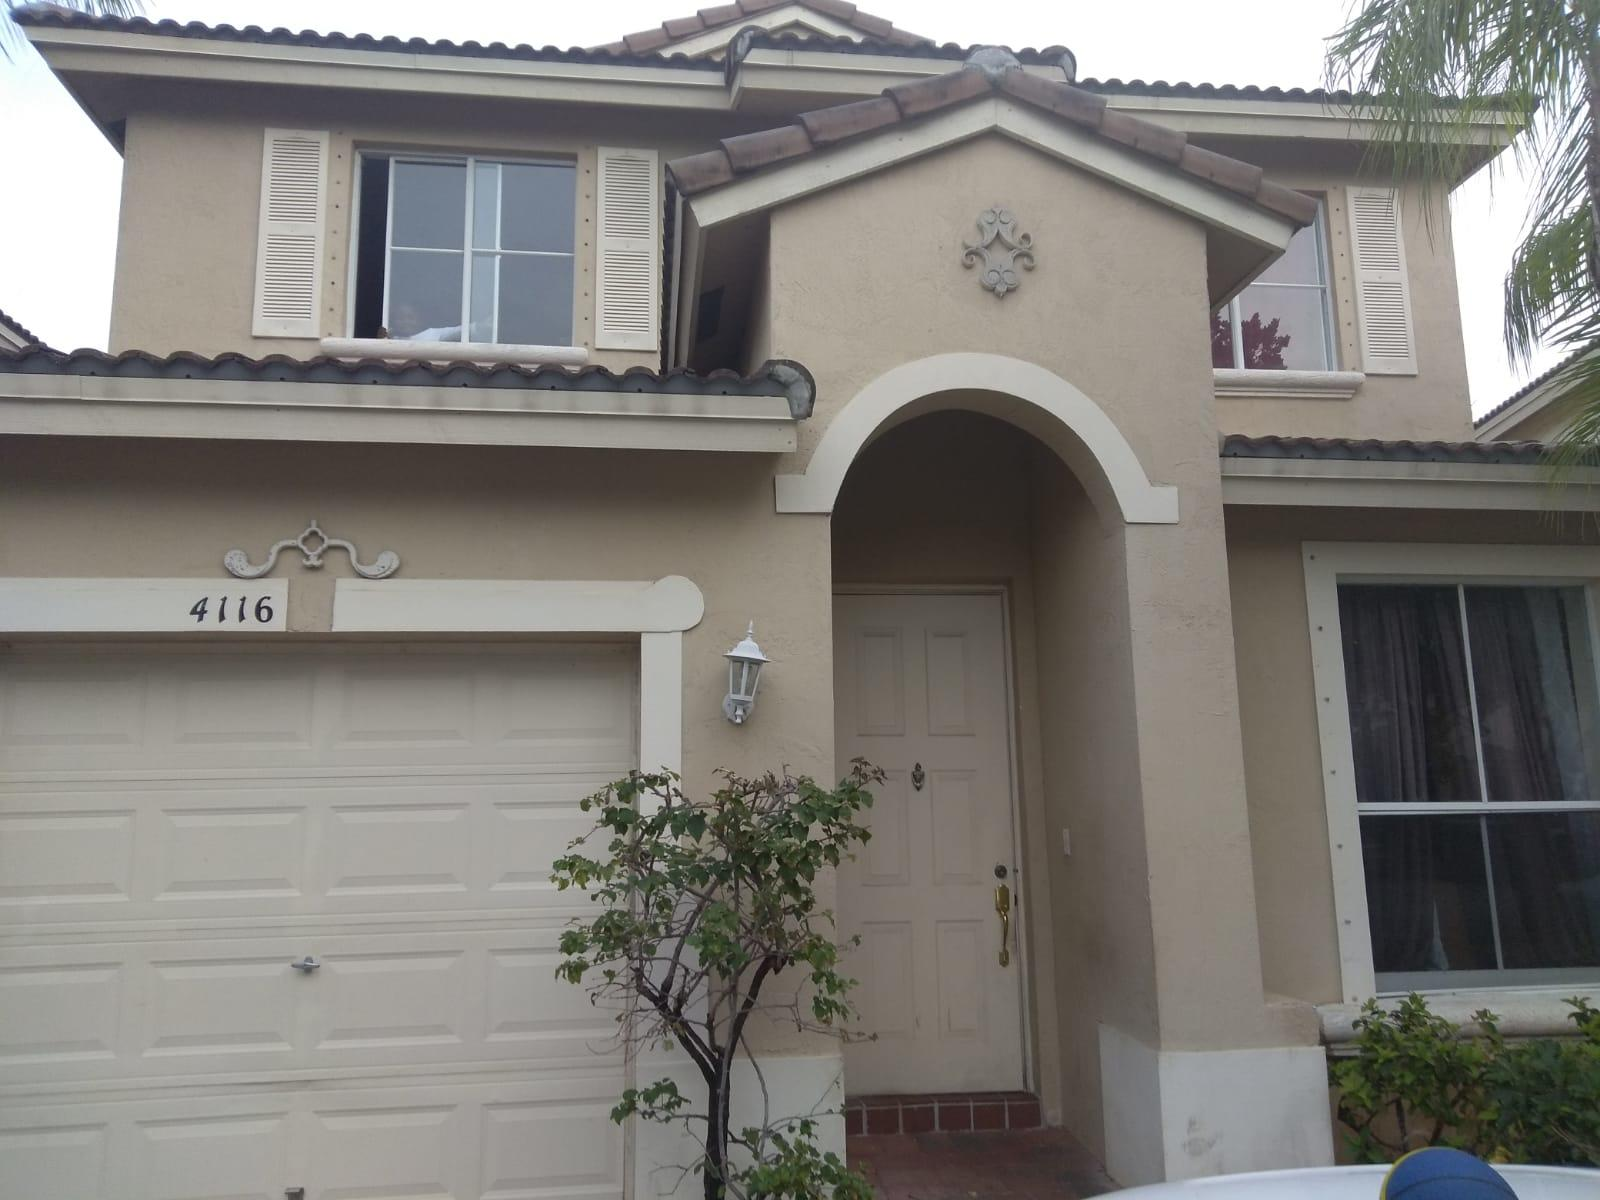 4116 Meade Way West Palm Beach, FL 33409